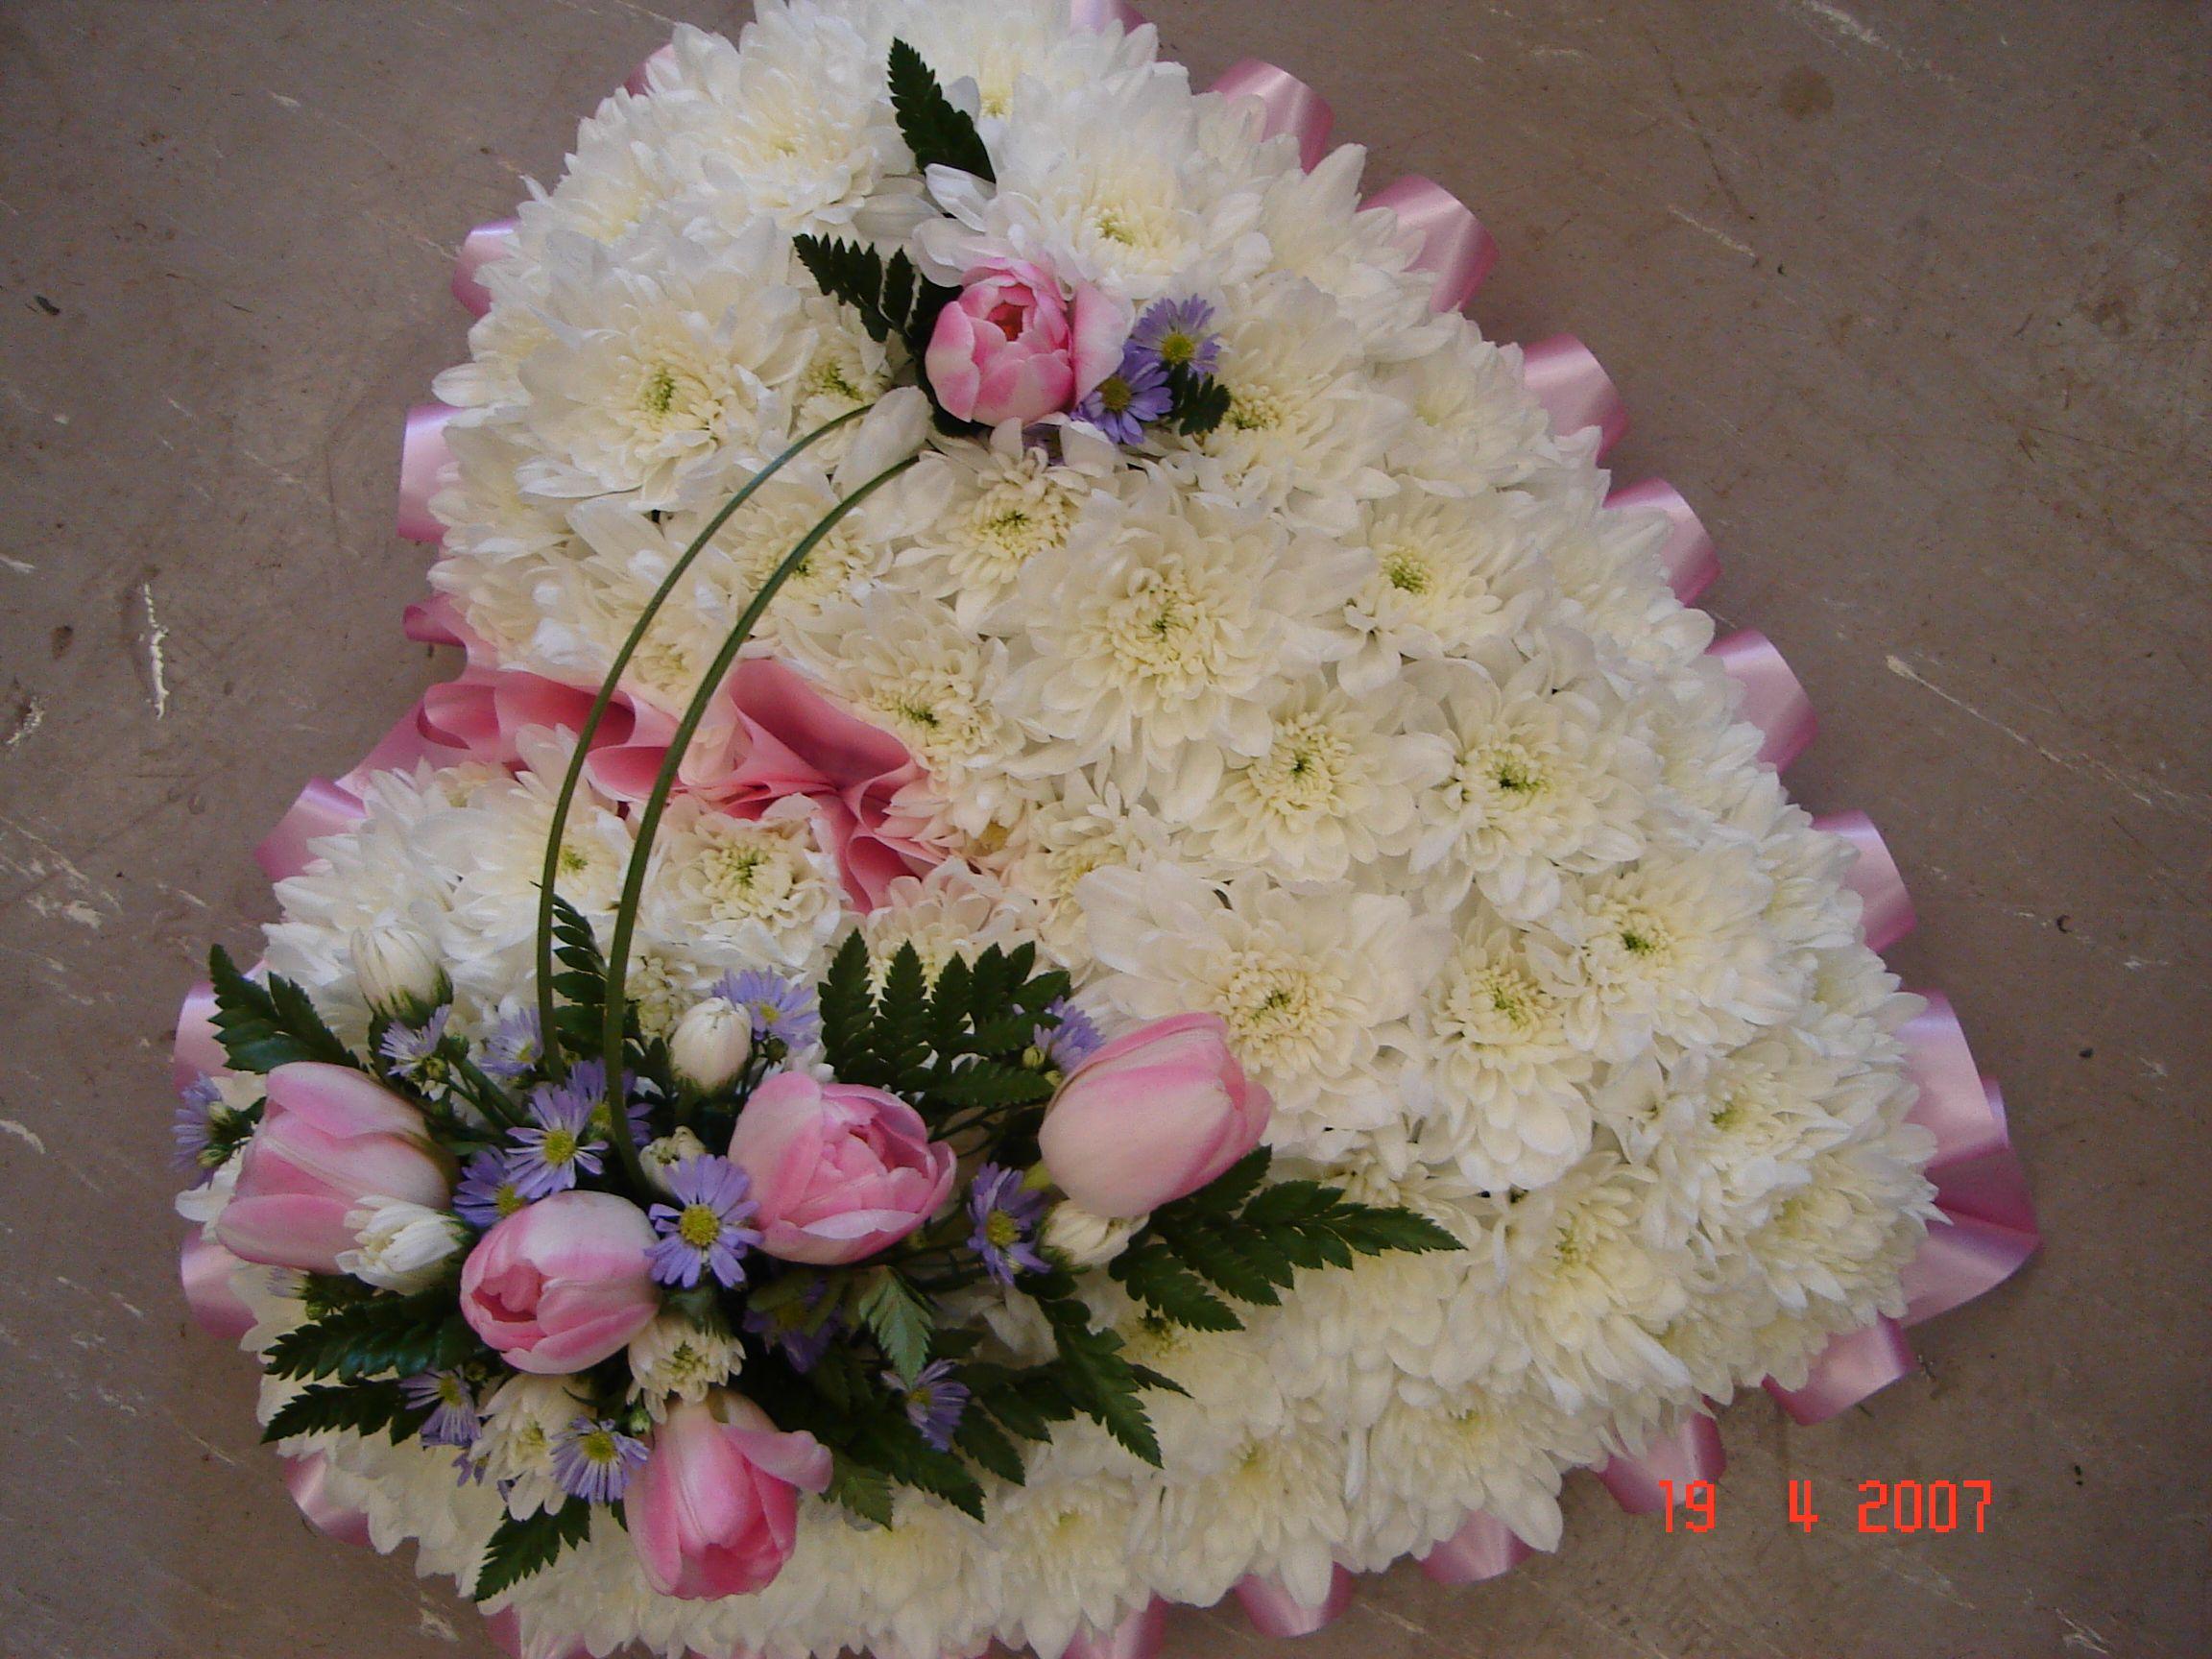 Heart Shaped Silk Artificial Funeral Flowers Wreathmemorialgrave